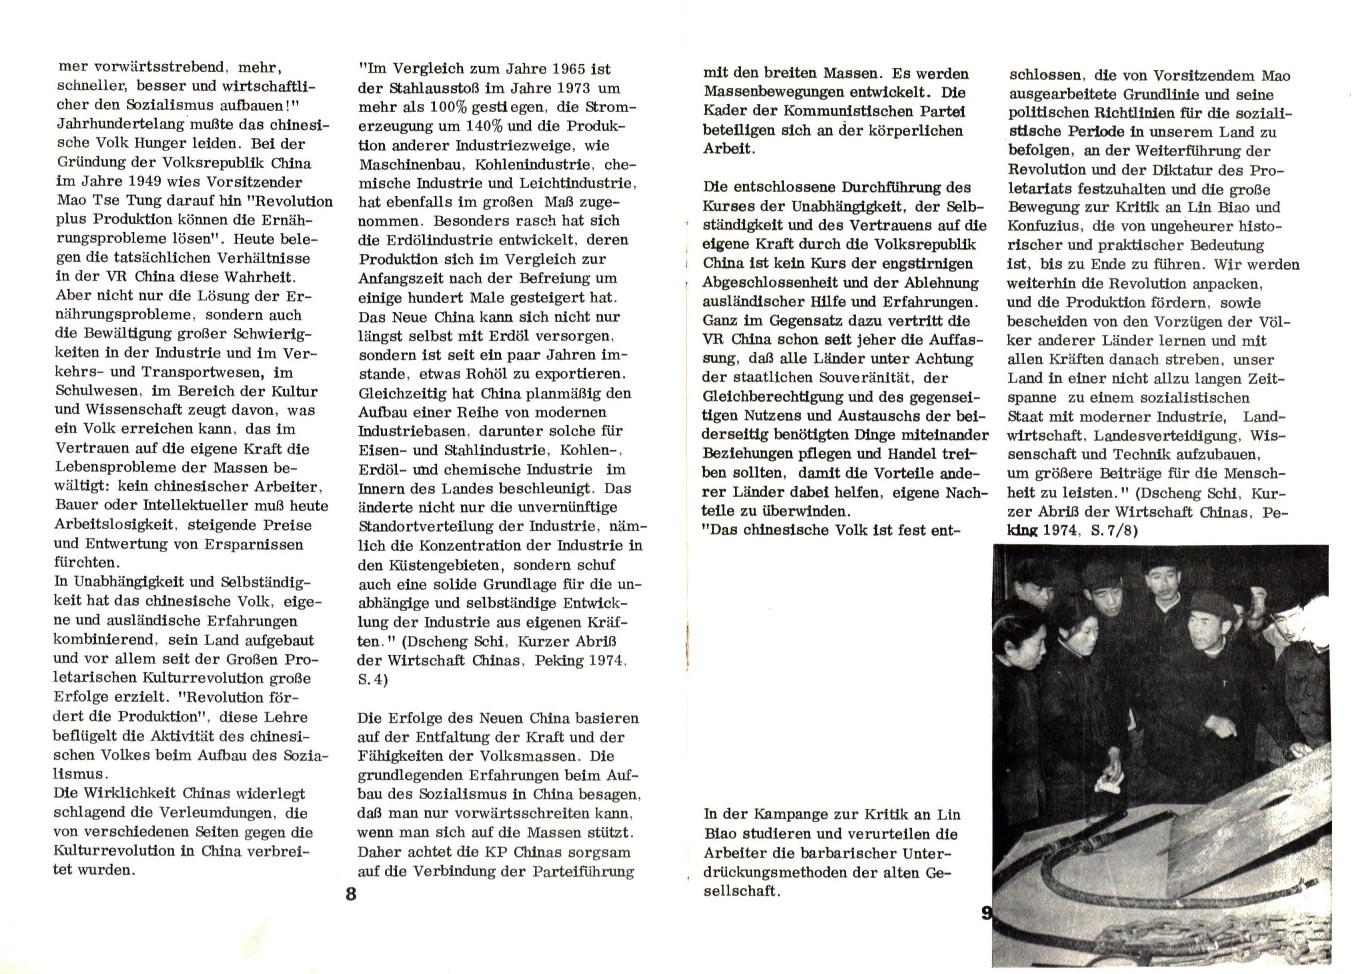 KPDAO_1975_Nationalausstellung_VRCh_in_Koeln_05